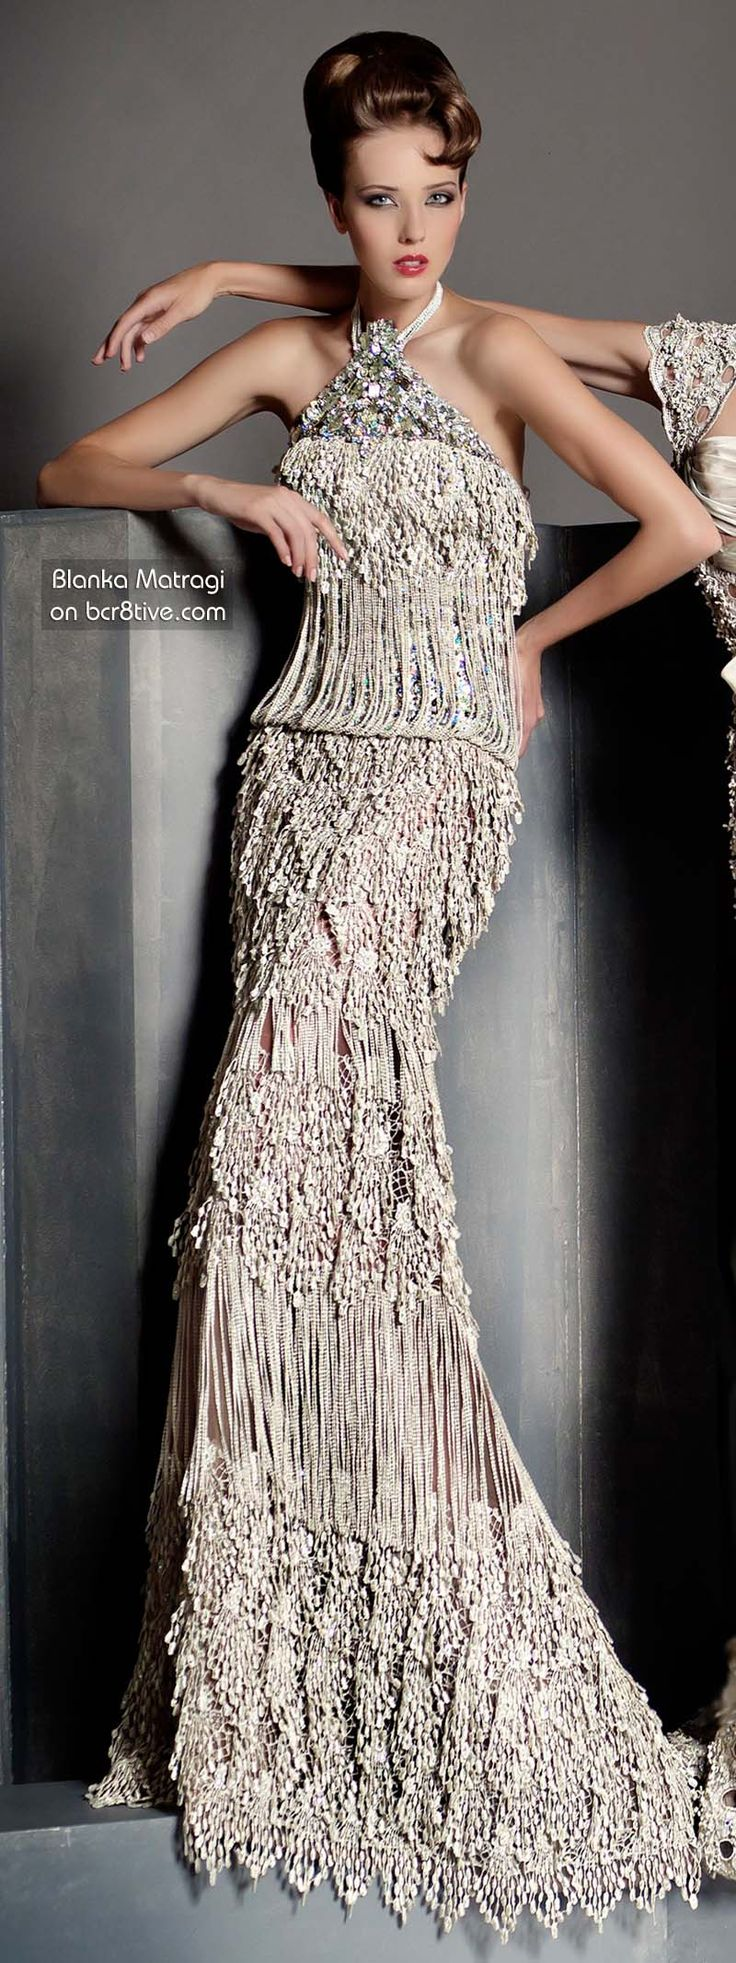 The Versatile Talents of Artisan Blanka Matragi » Blanka Matragi 30th Anniversary Couture Collection - Wedding Dress